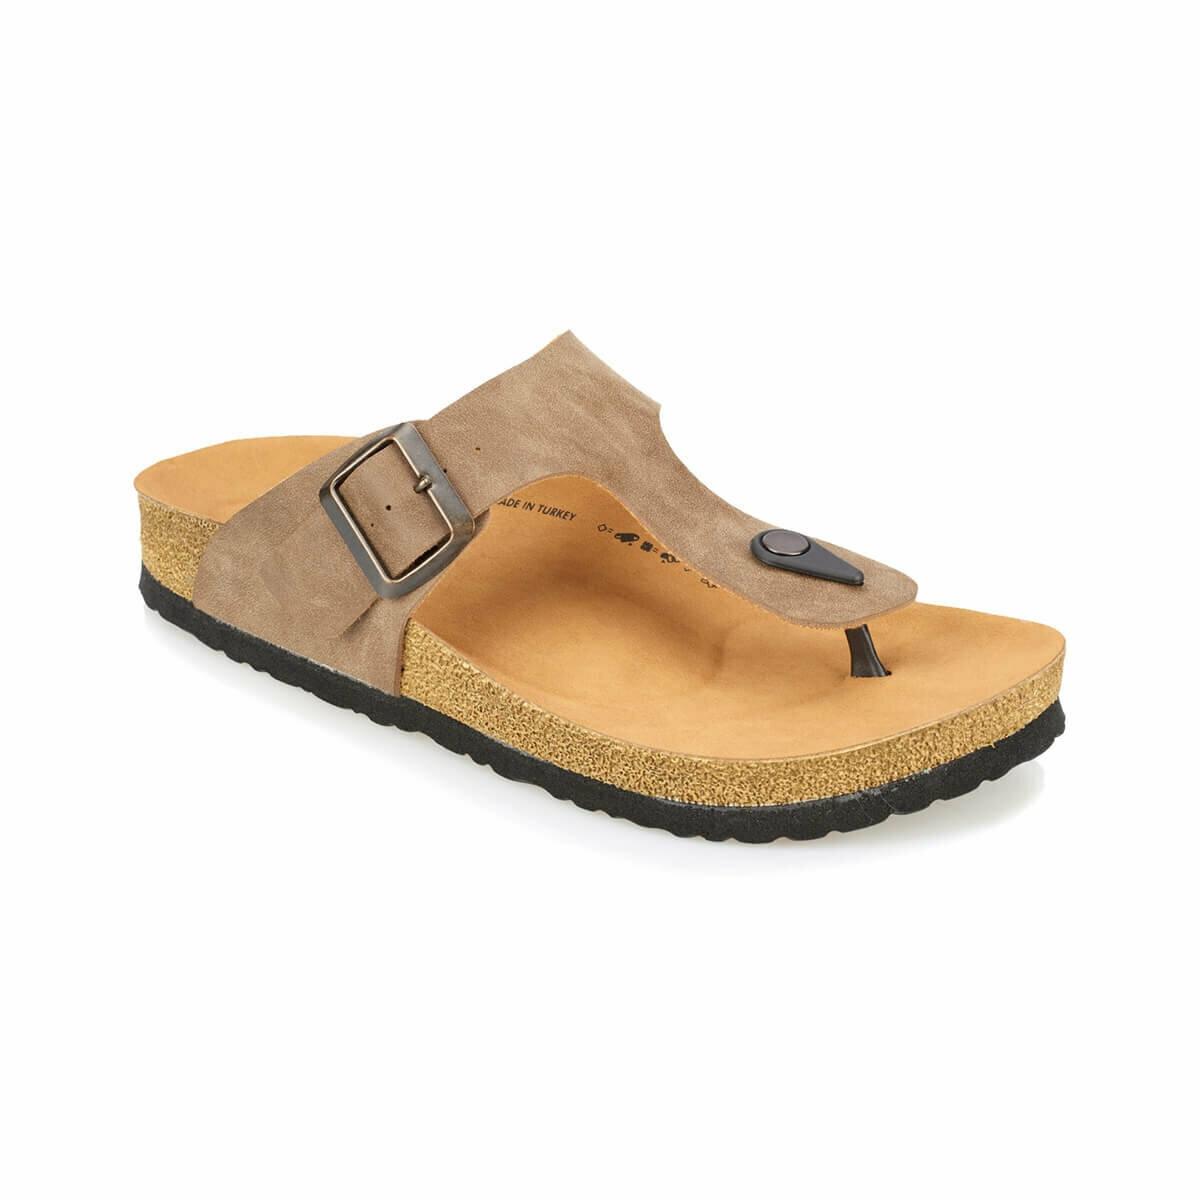 FLO MEROL Sand Color Male Slippers KINETIX